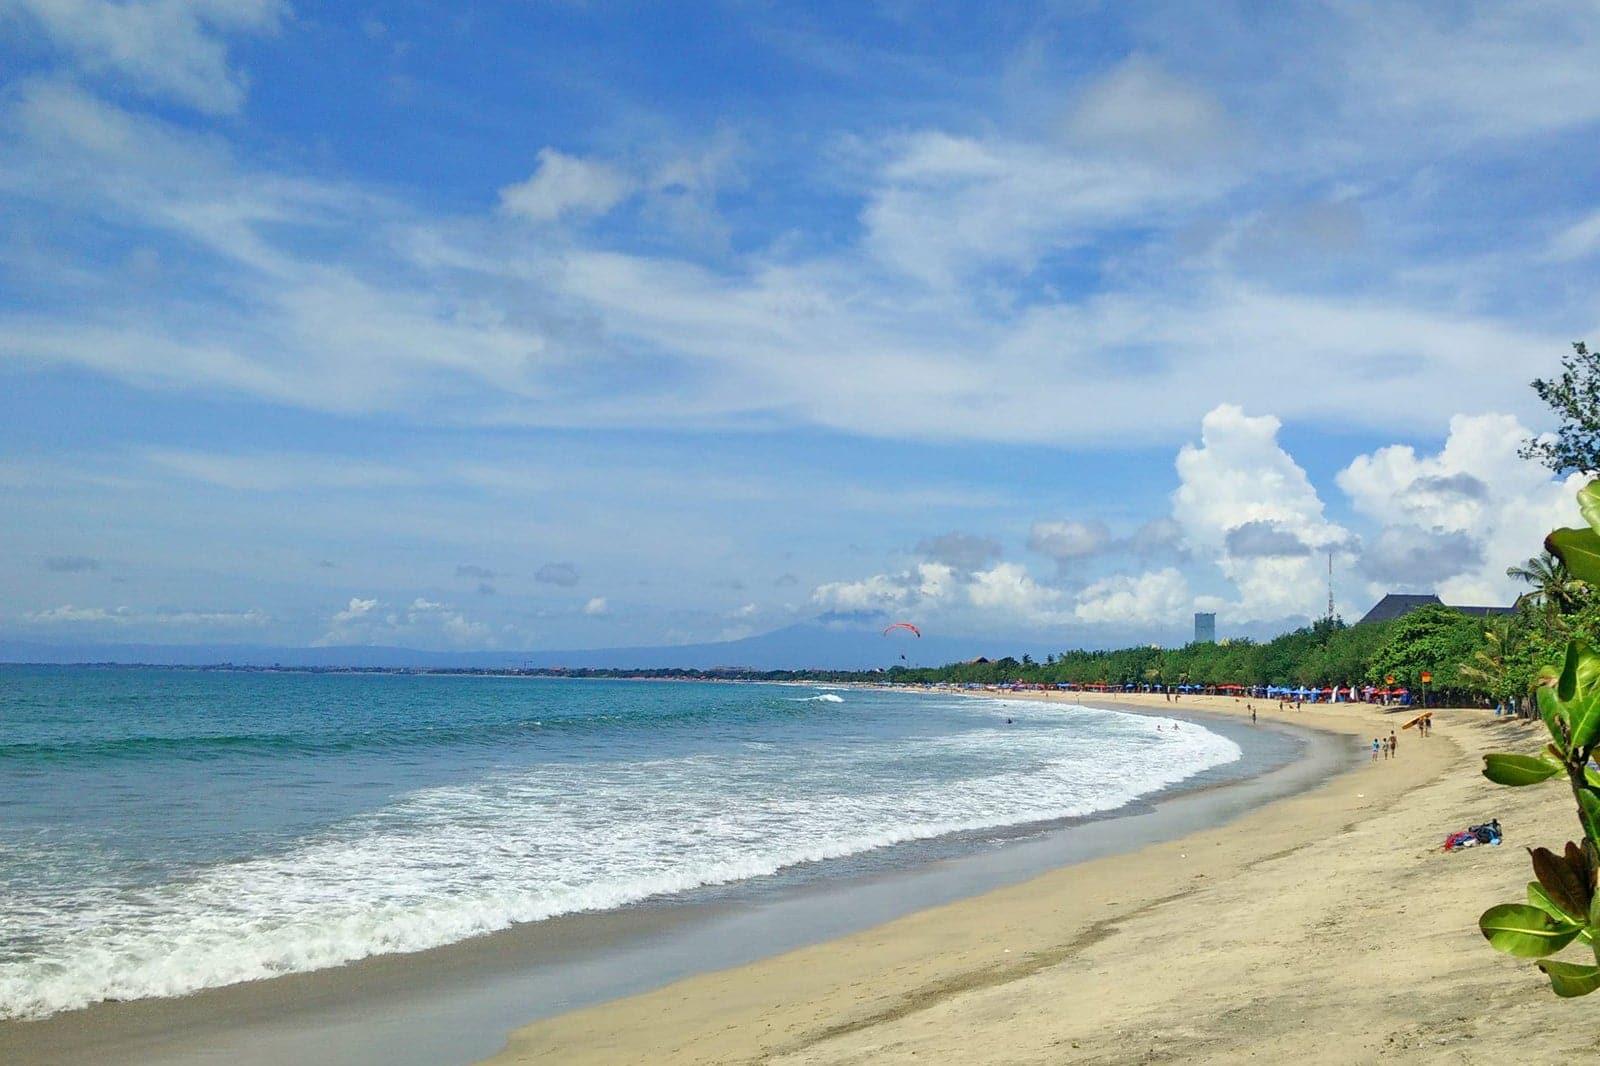 Imagen de la Playa Kuta Beach